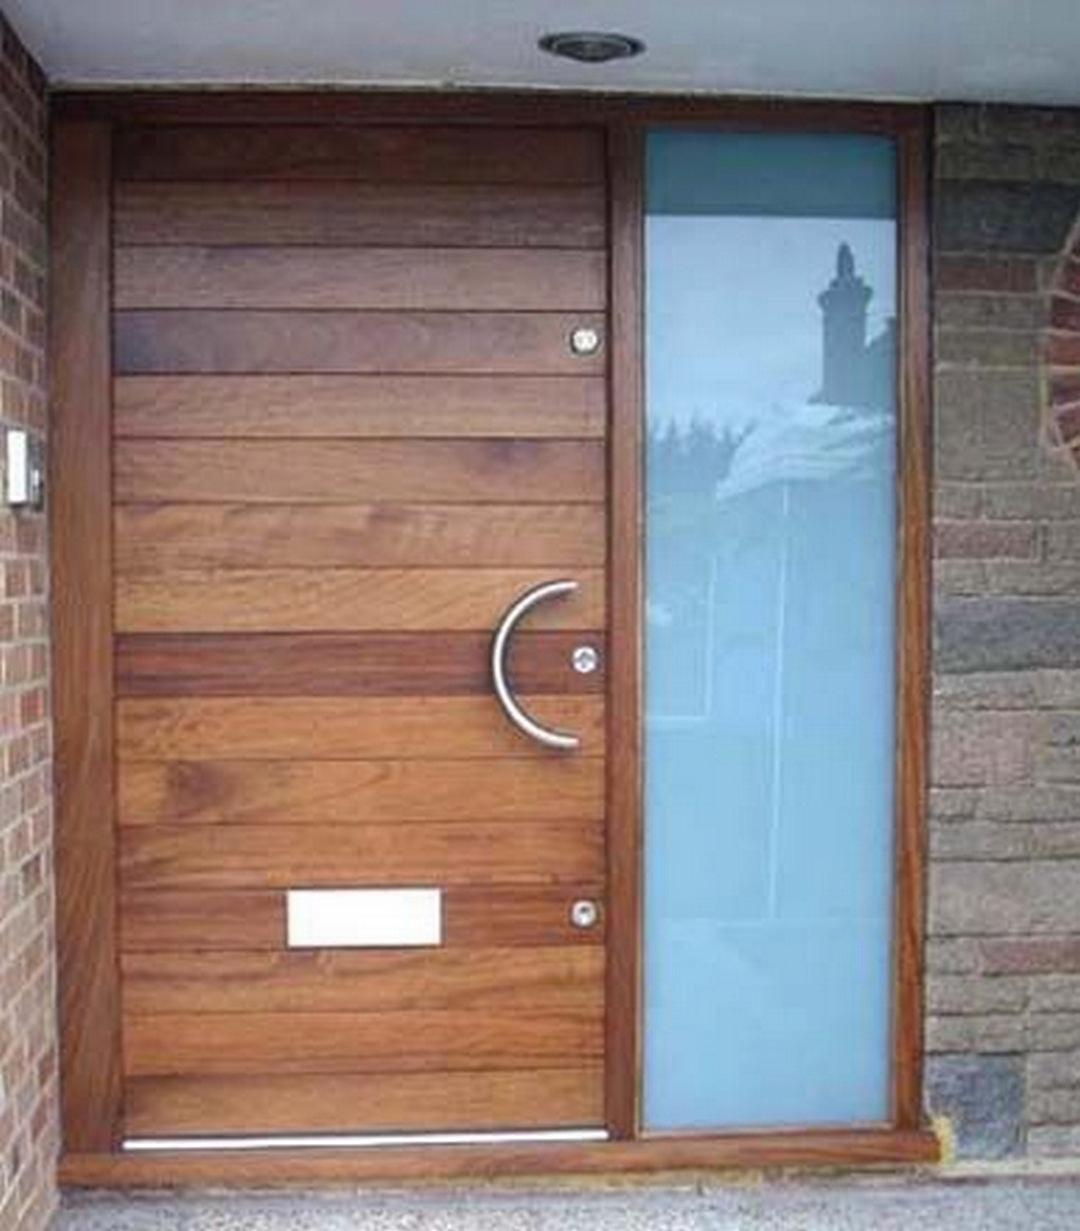 29 nice contemporary exterior door design ideas house design and plan ideas contemporary. Black Bedroom Furniture Sets. Home Design Ideas